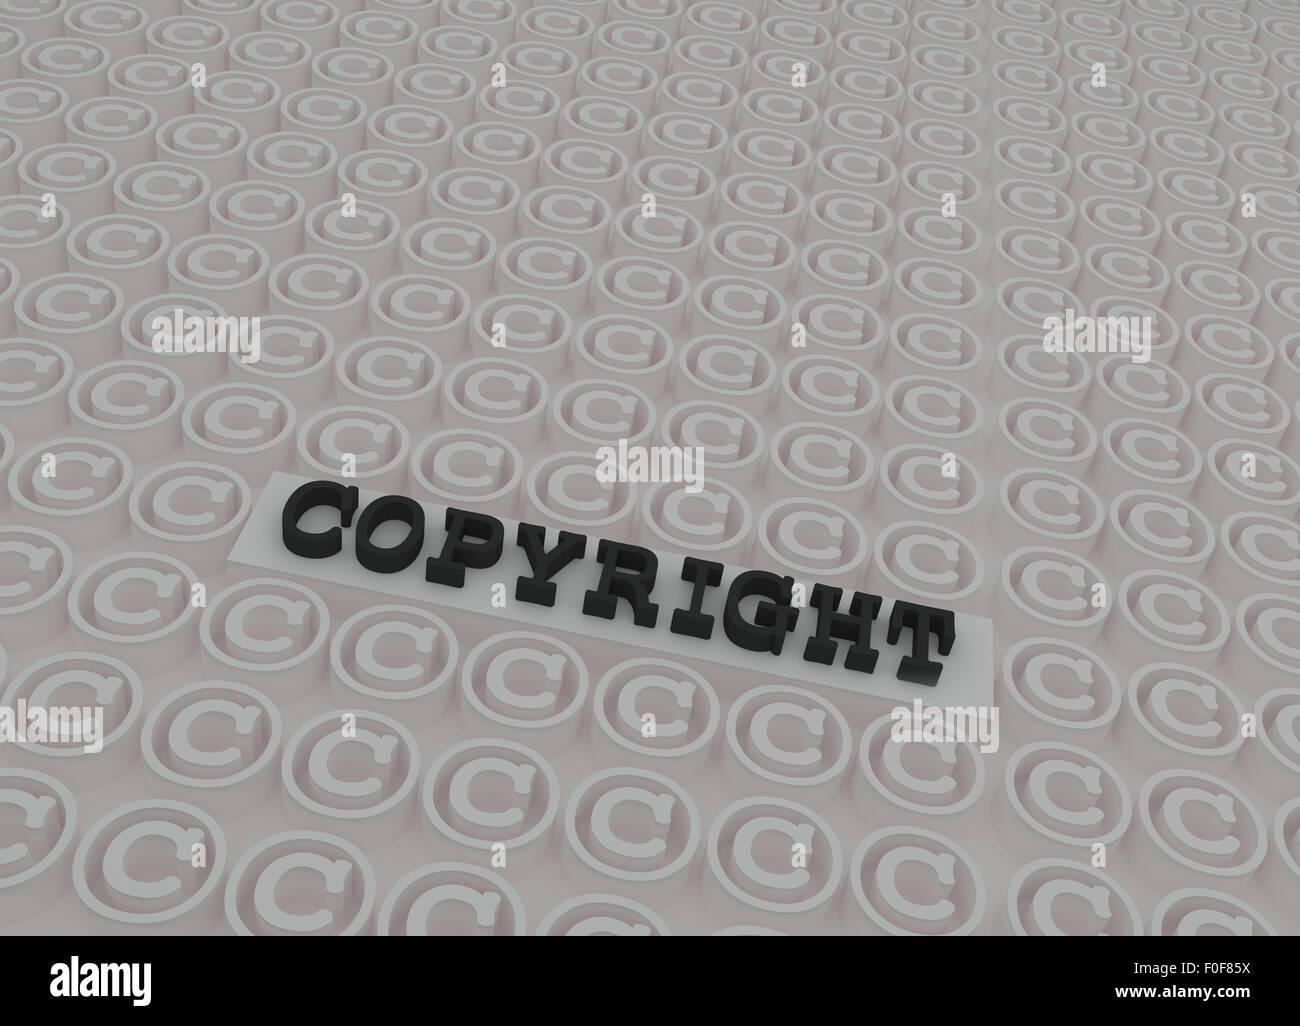 Black 3d copyright text on platform inside 3d copyright white symbols. Stock Photo